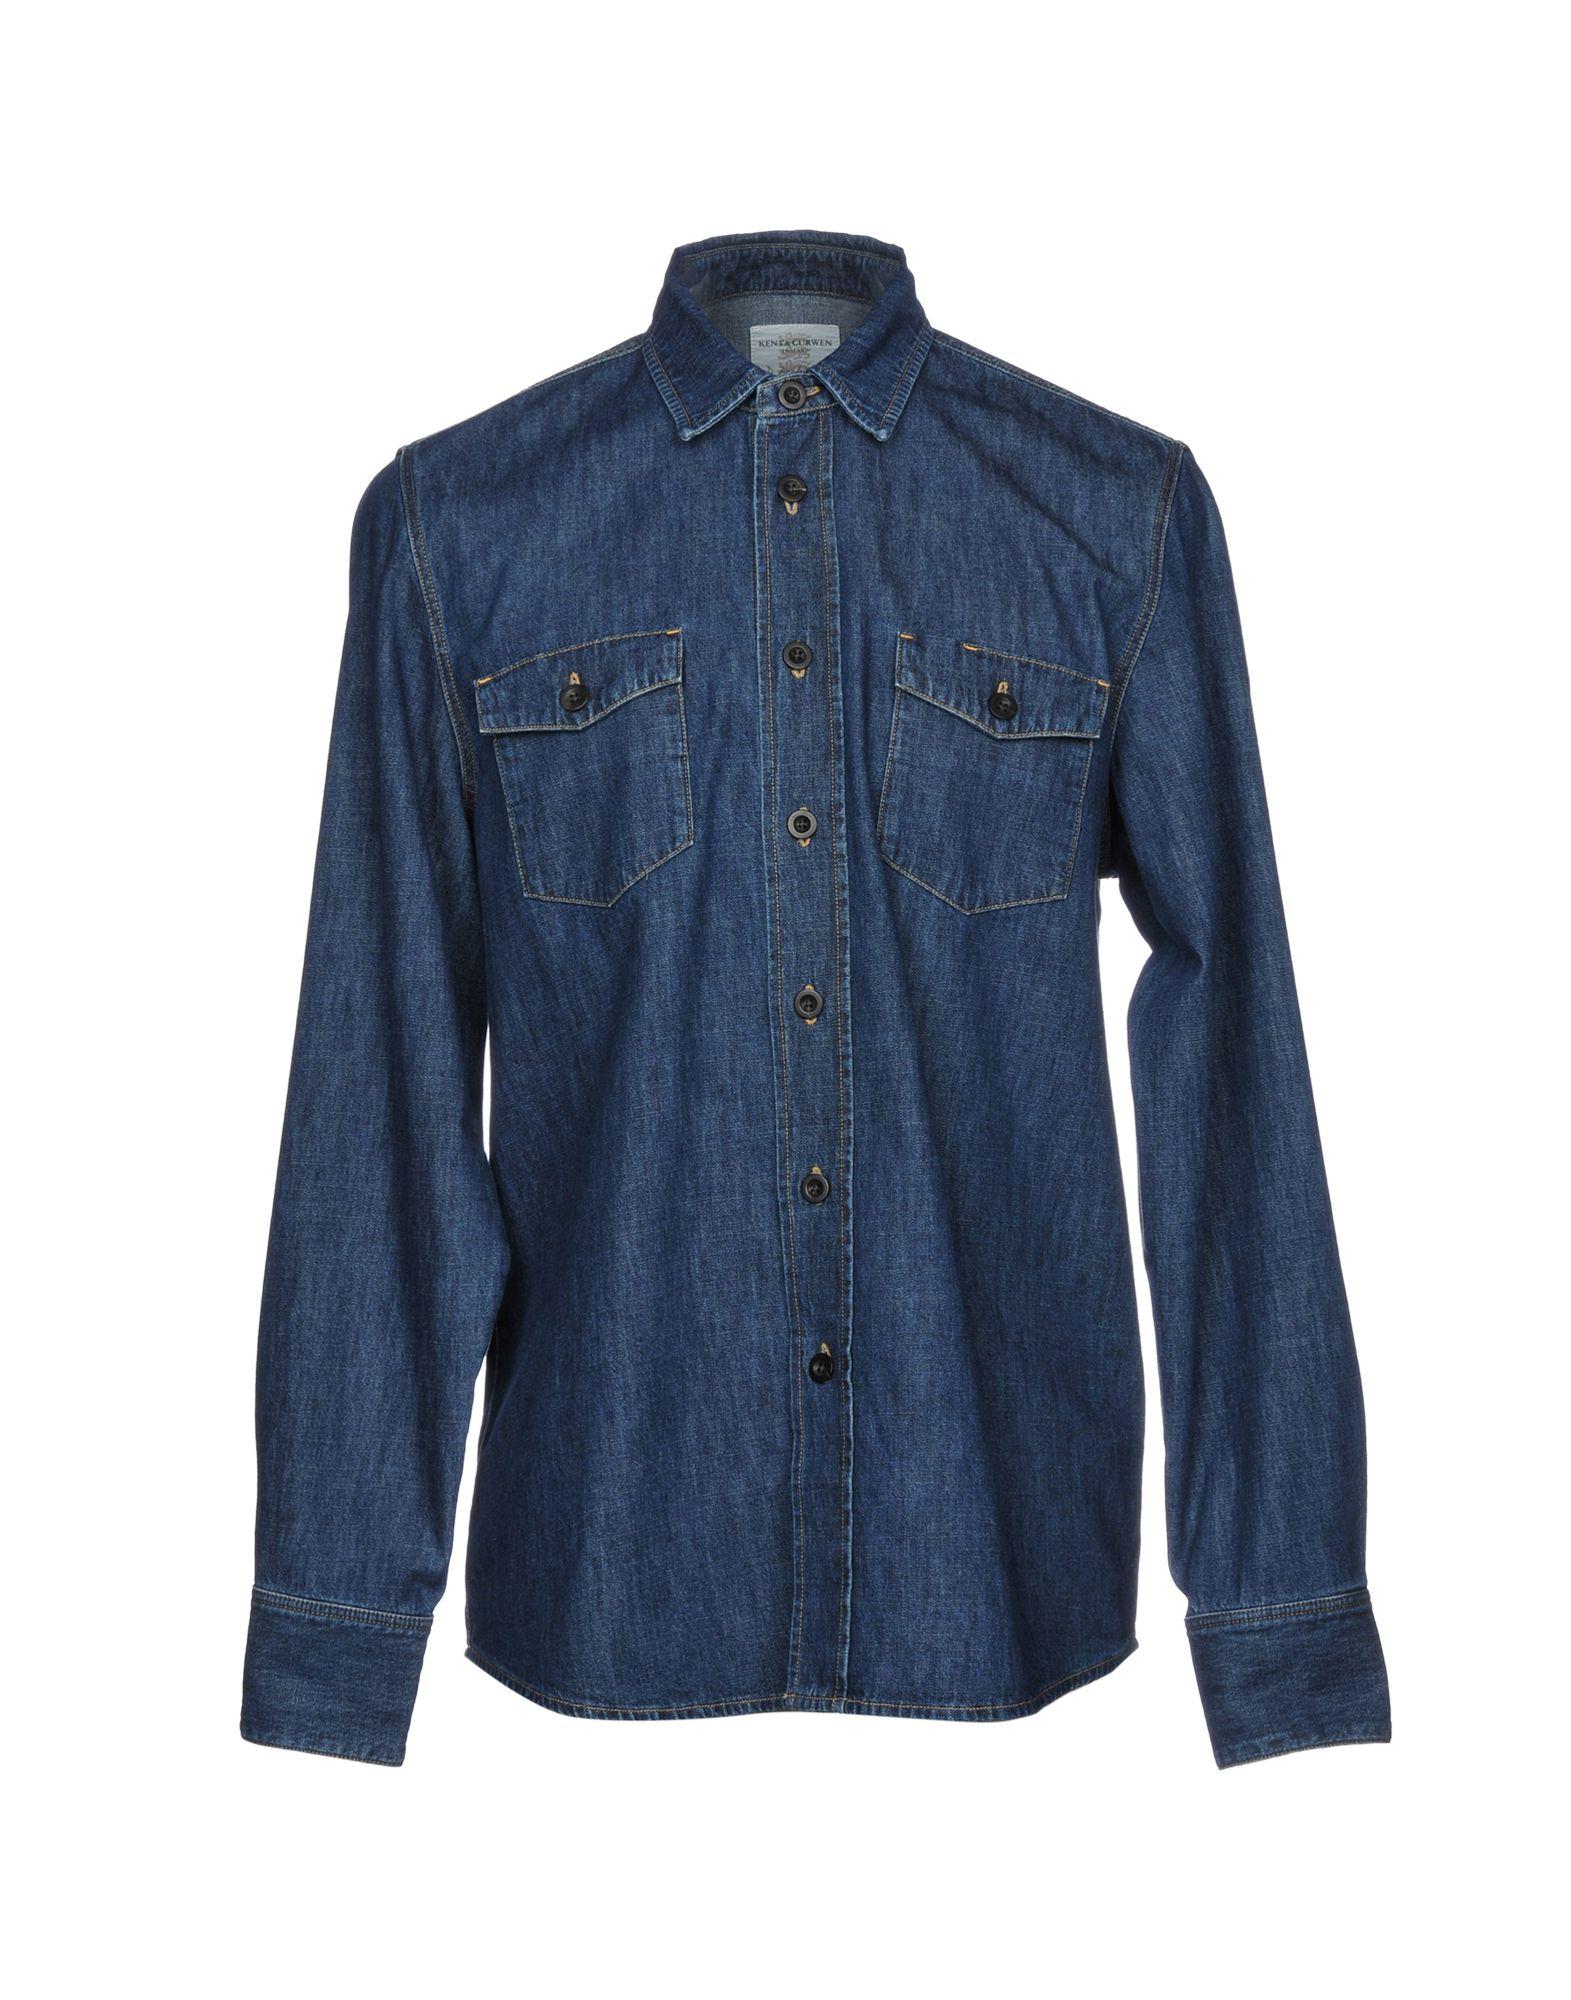 su Curwen Acquista Kent Camicia Jeans amp; Donna online qwAFF0v